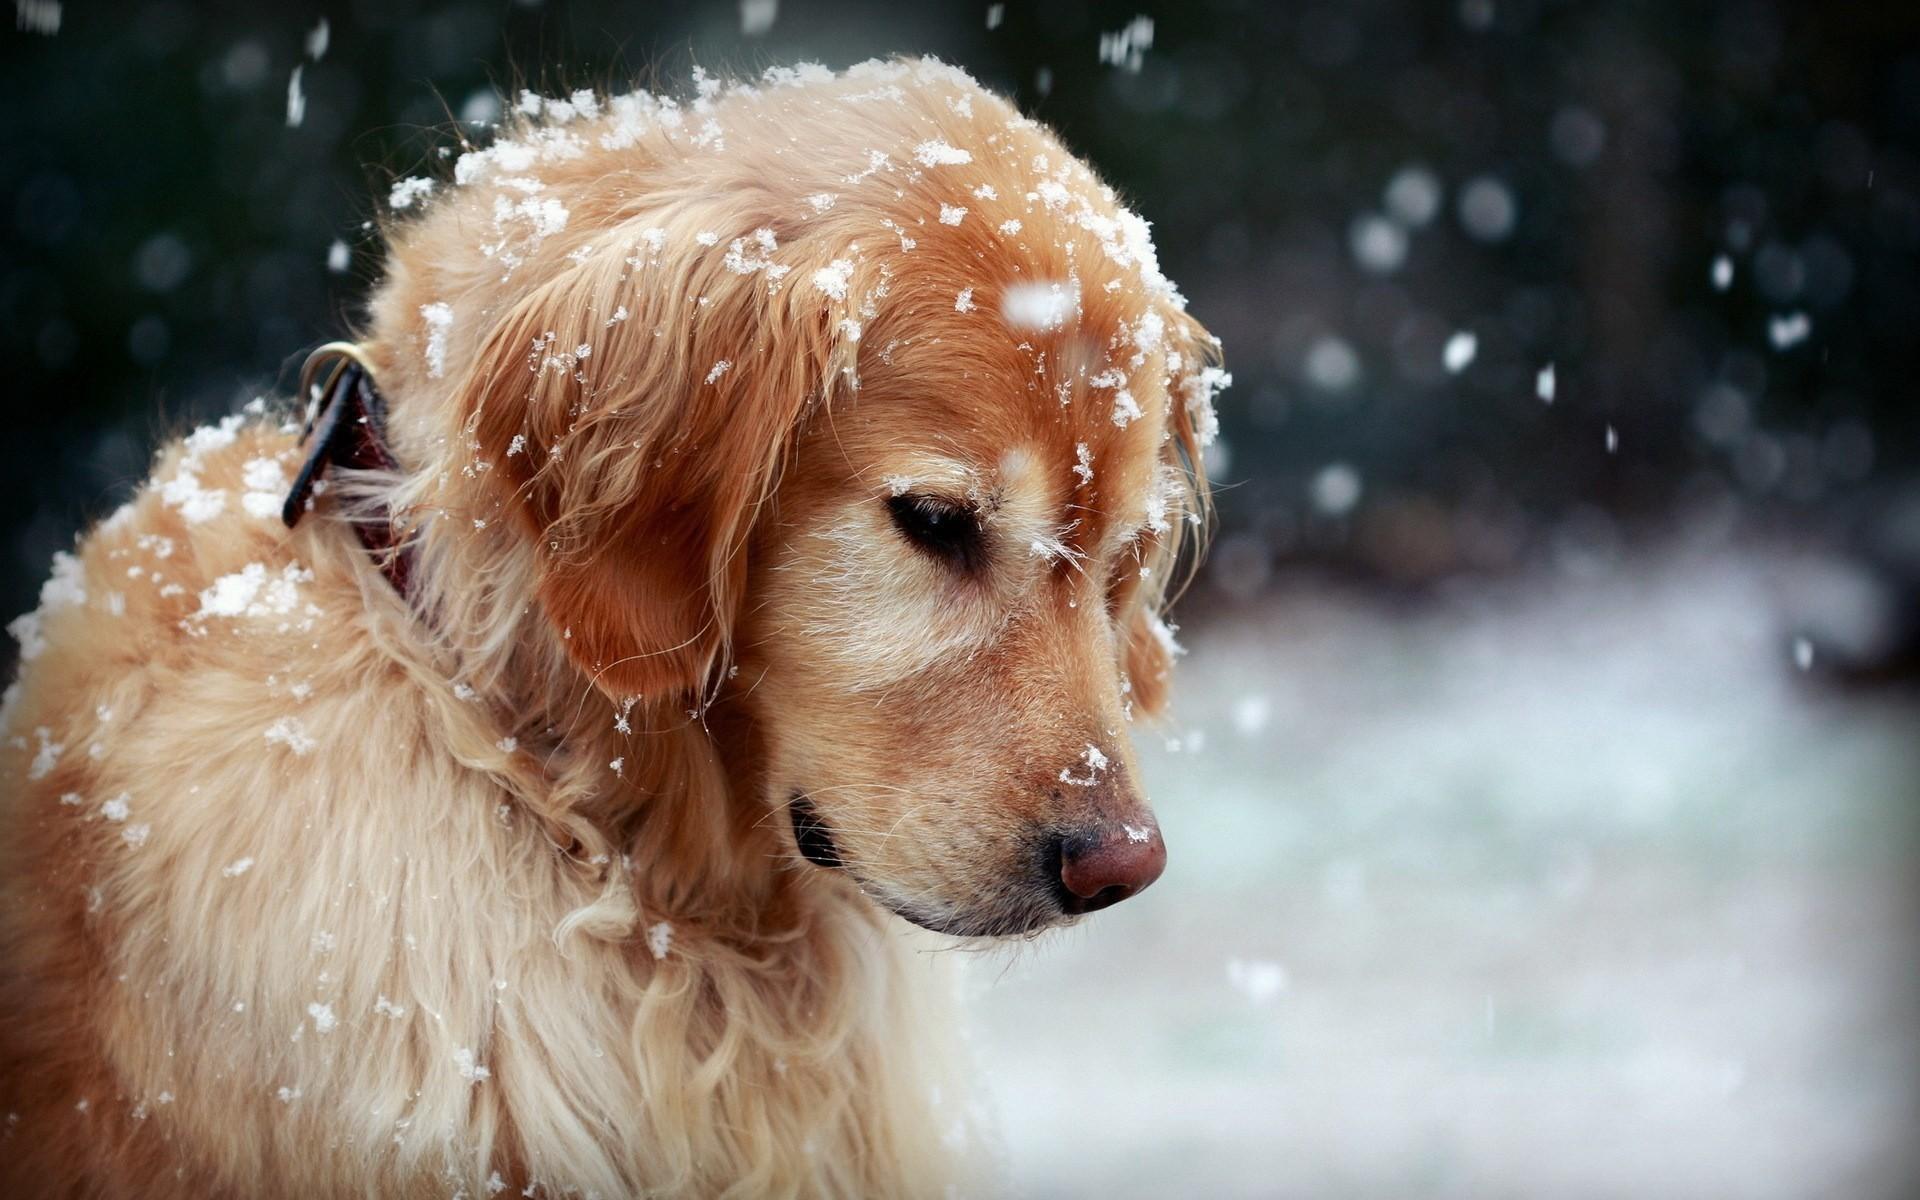 … winter dog snowflakes hd wallpaper dog wallpaper hd free …